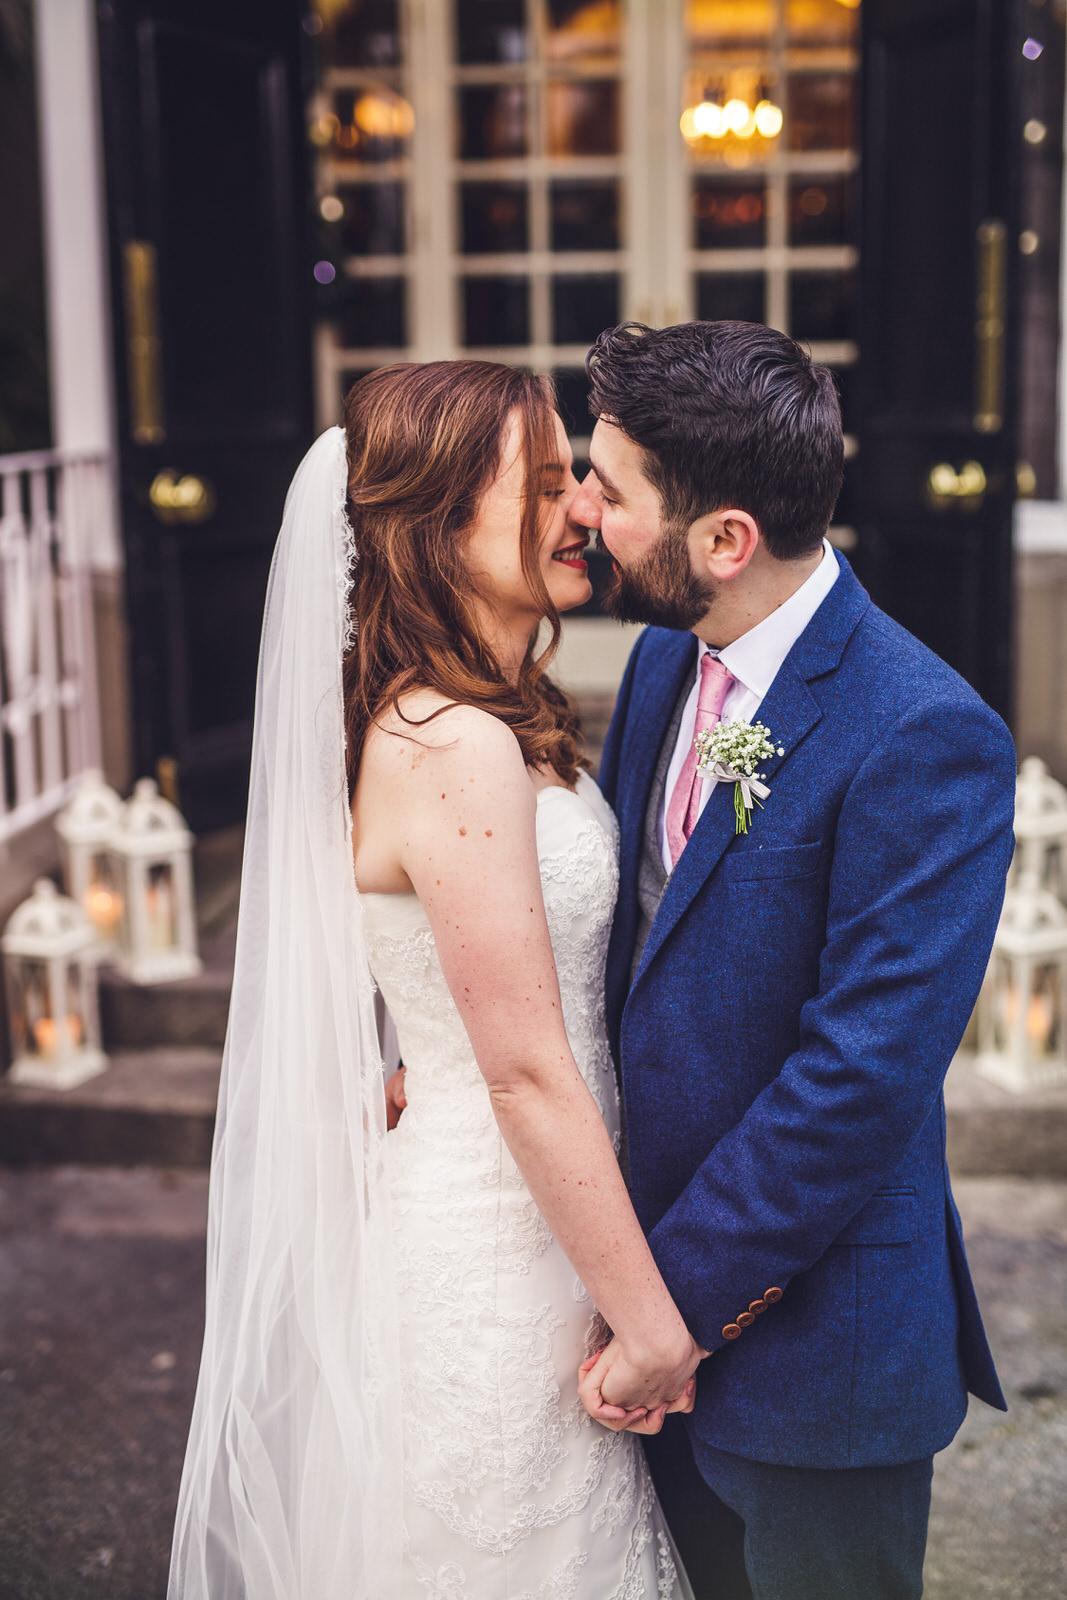 Roger-kenny-wedding-photographer-greystones-wicklow-dublin_073.jpg